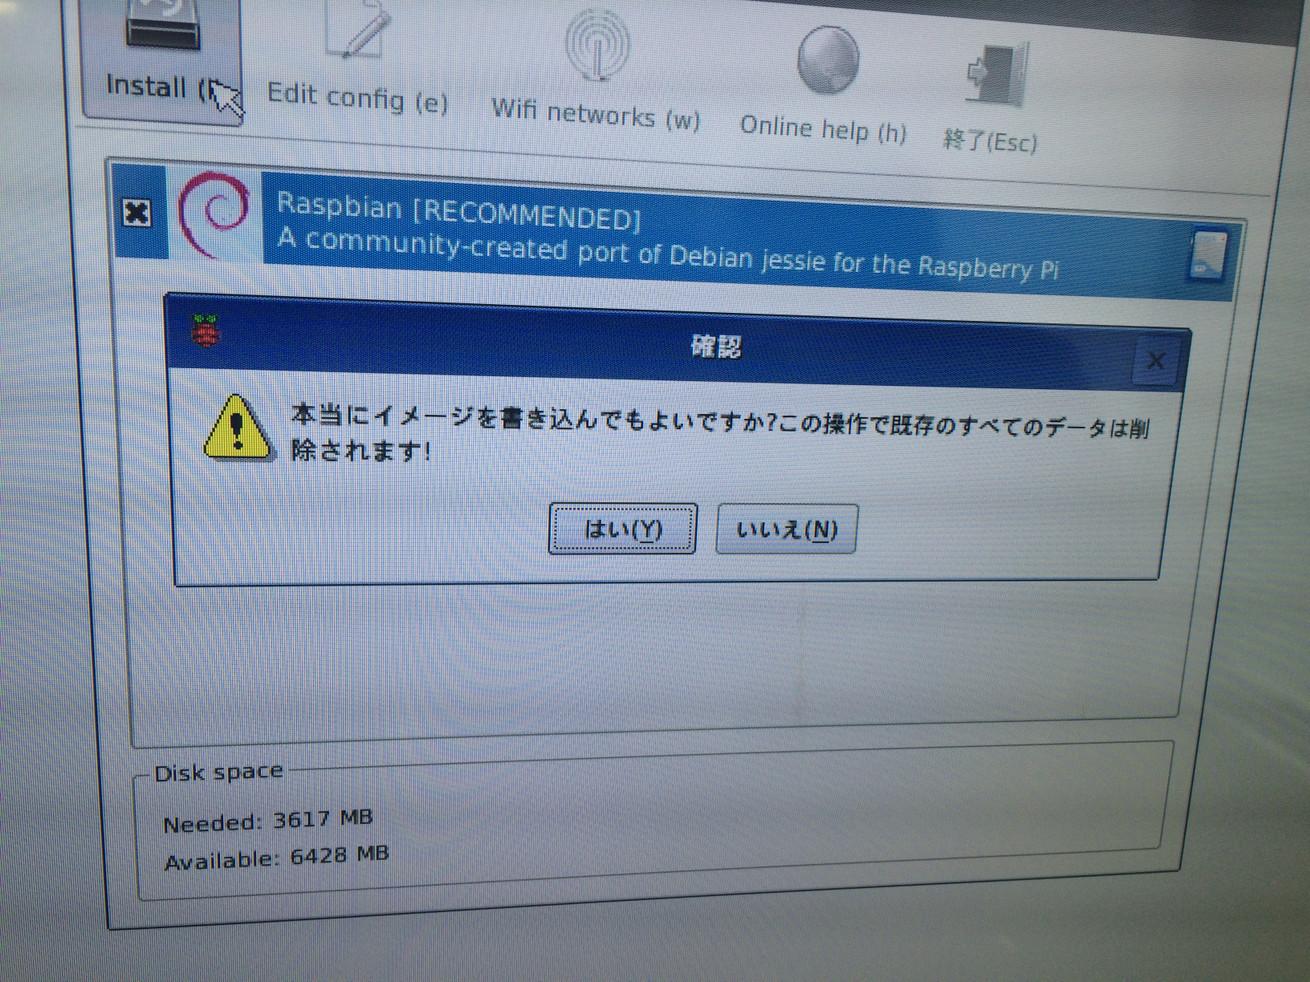 Raspbianインストール確認画面